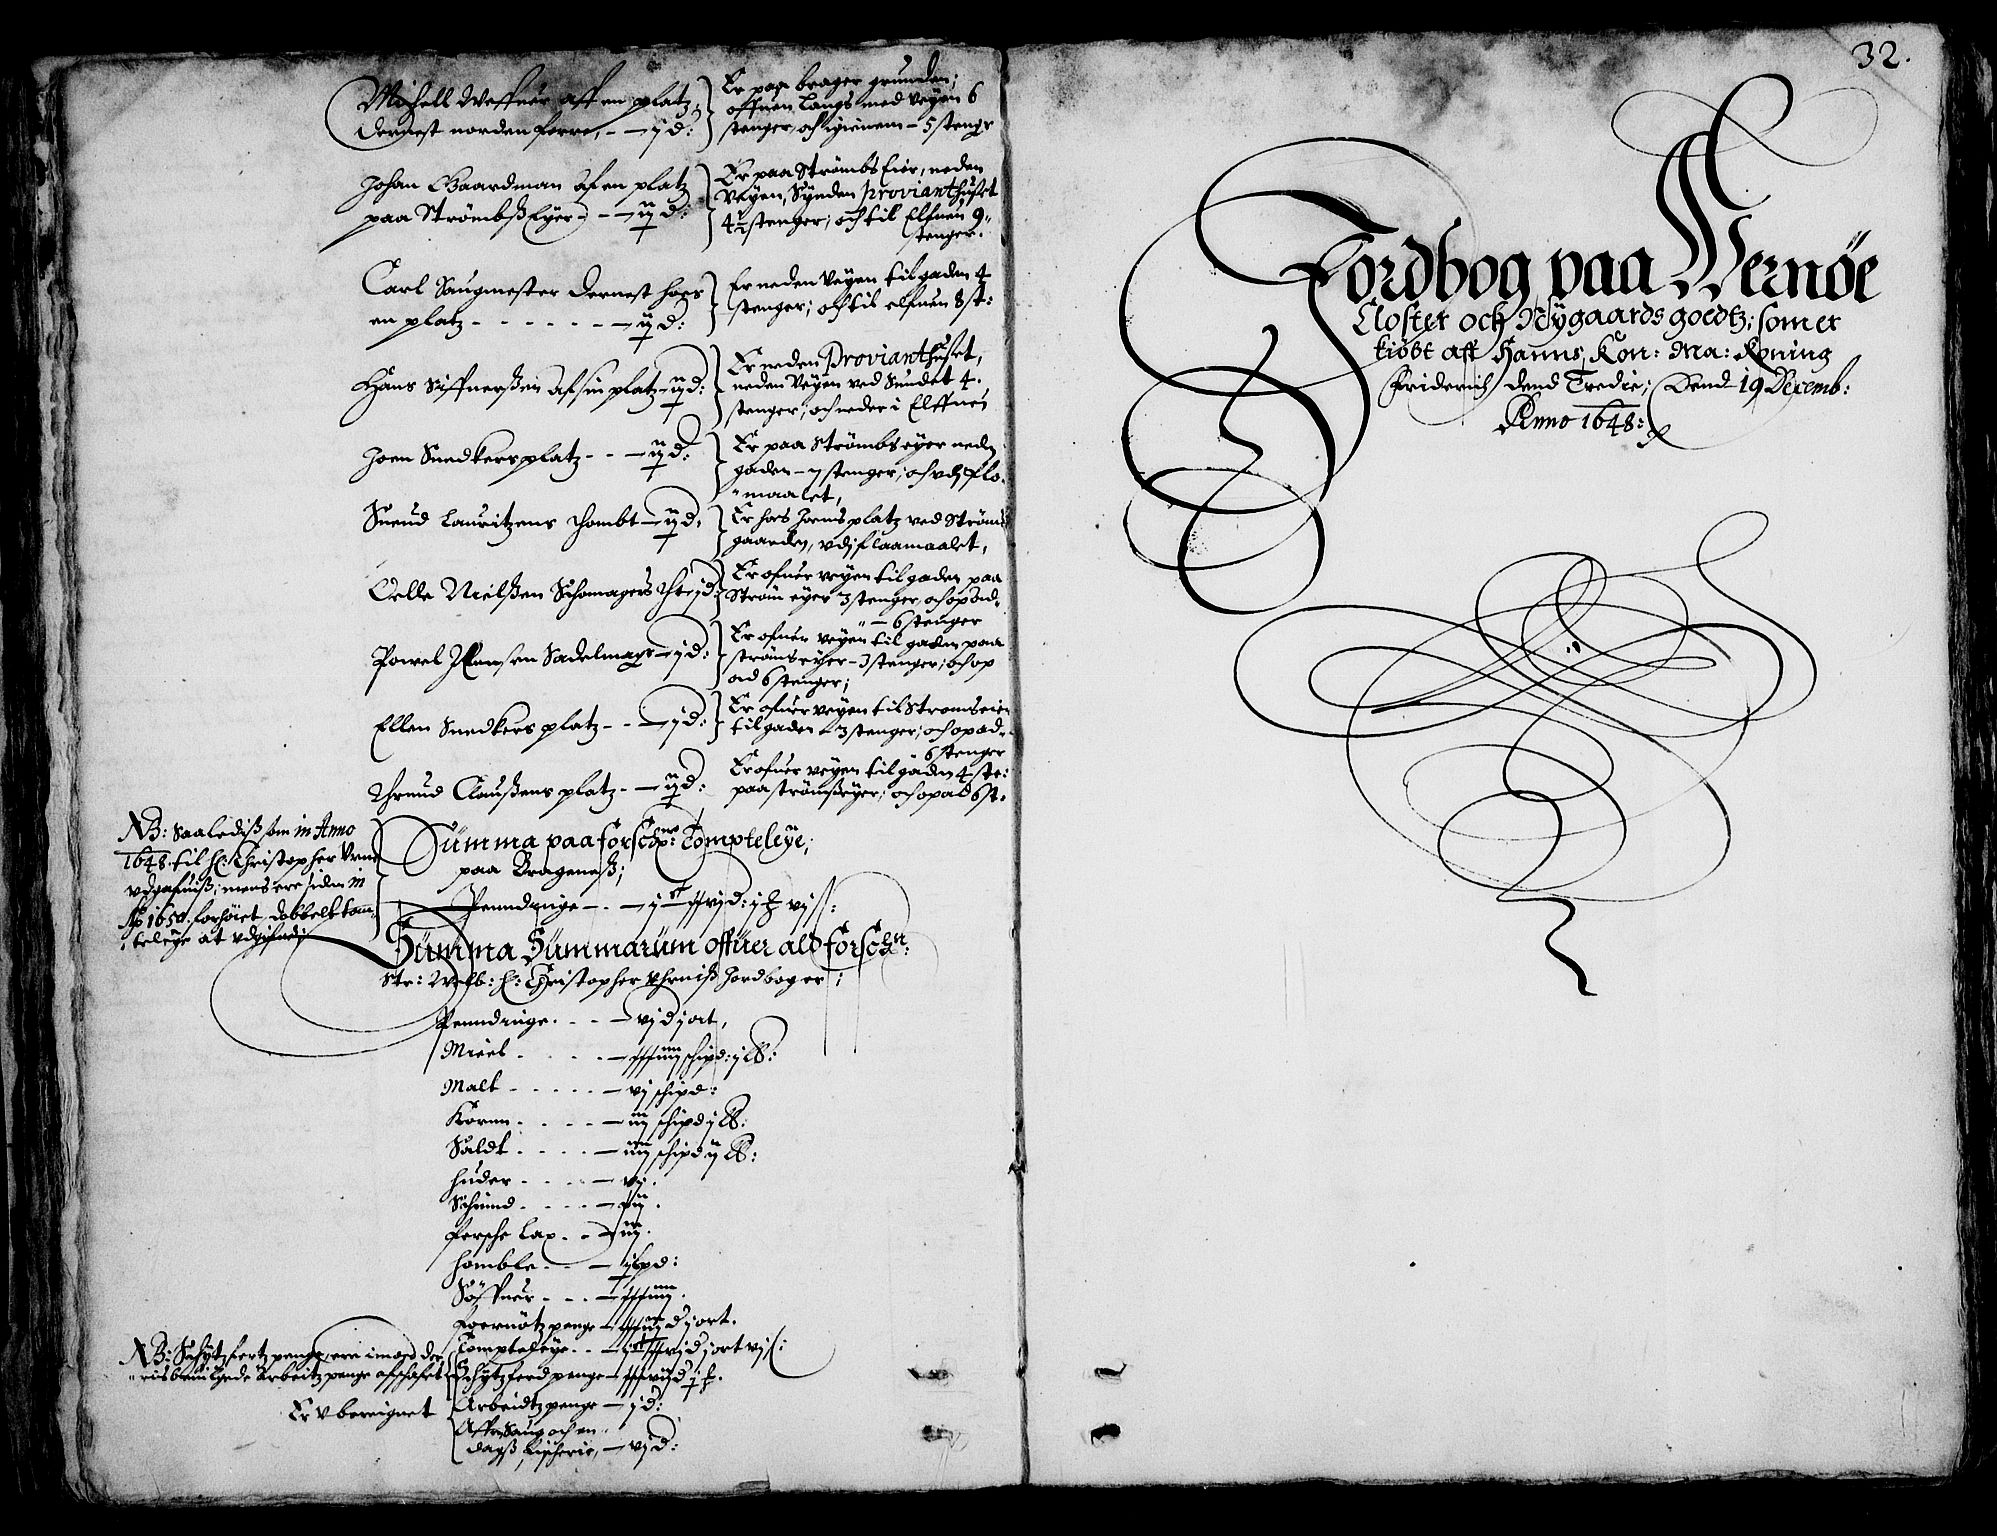 RA, Rentekammeret inntil 1814, Realistisk ordnet avdeling, On/L0001: Statens gods, 1651, s. 31b-32a